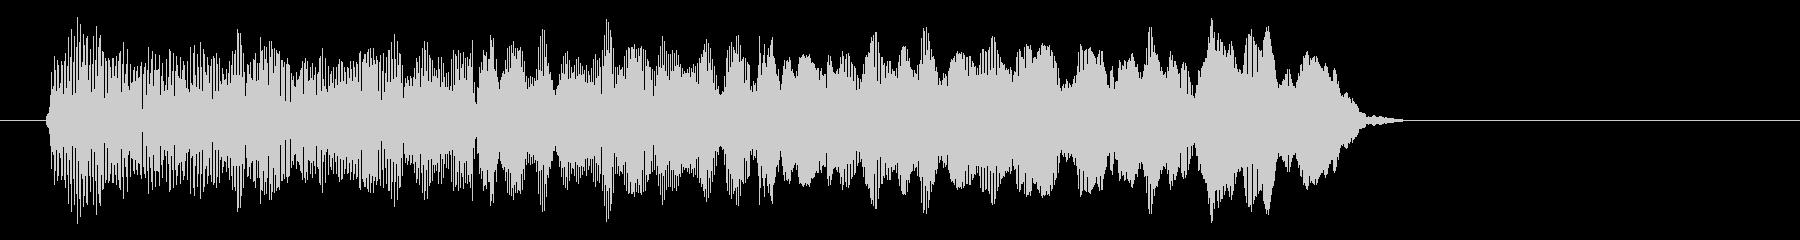 8bitパワーup-01-5_dryの未再生の波形